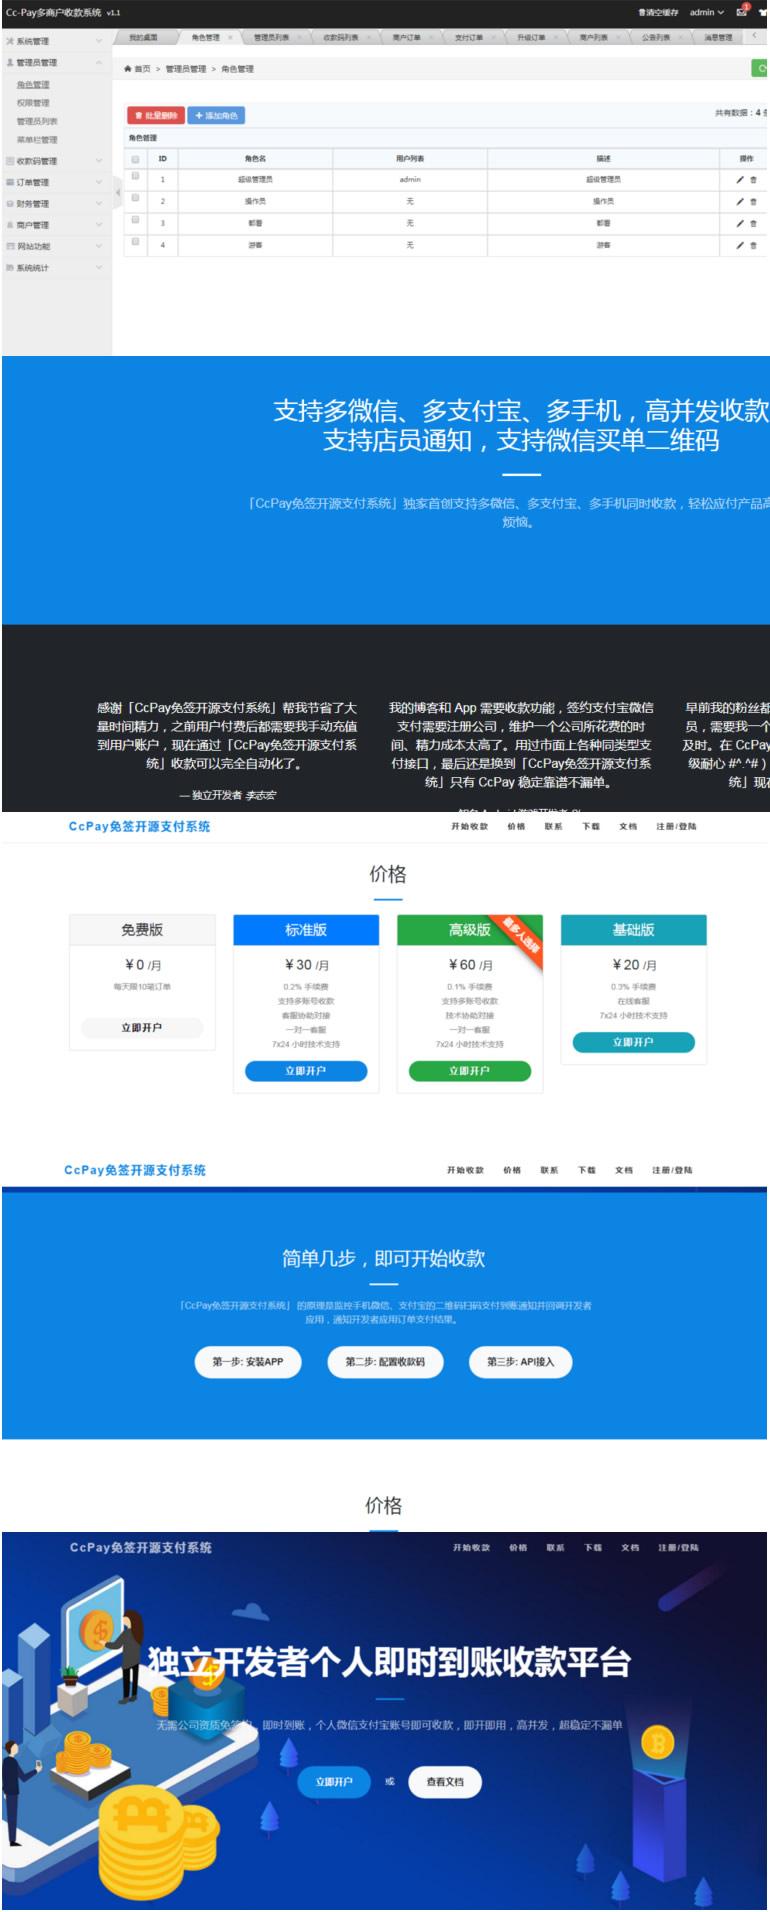 Cc-Pay多商户收款系统PHP网站源码 第1张